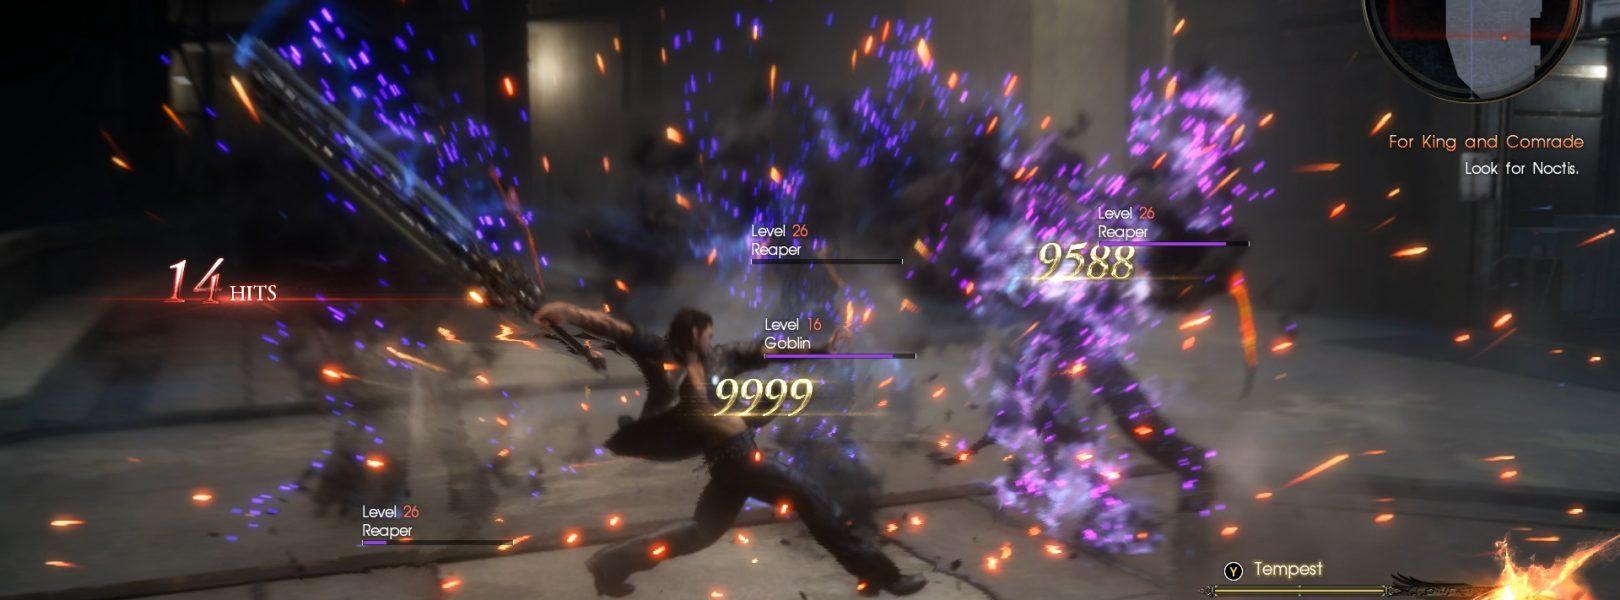 Final Fantasy XV – Capsule Computers